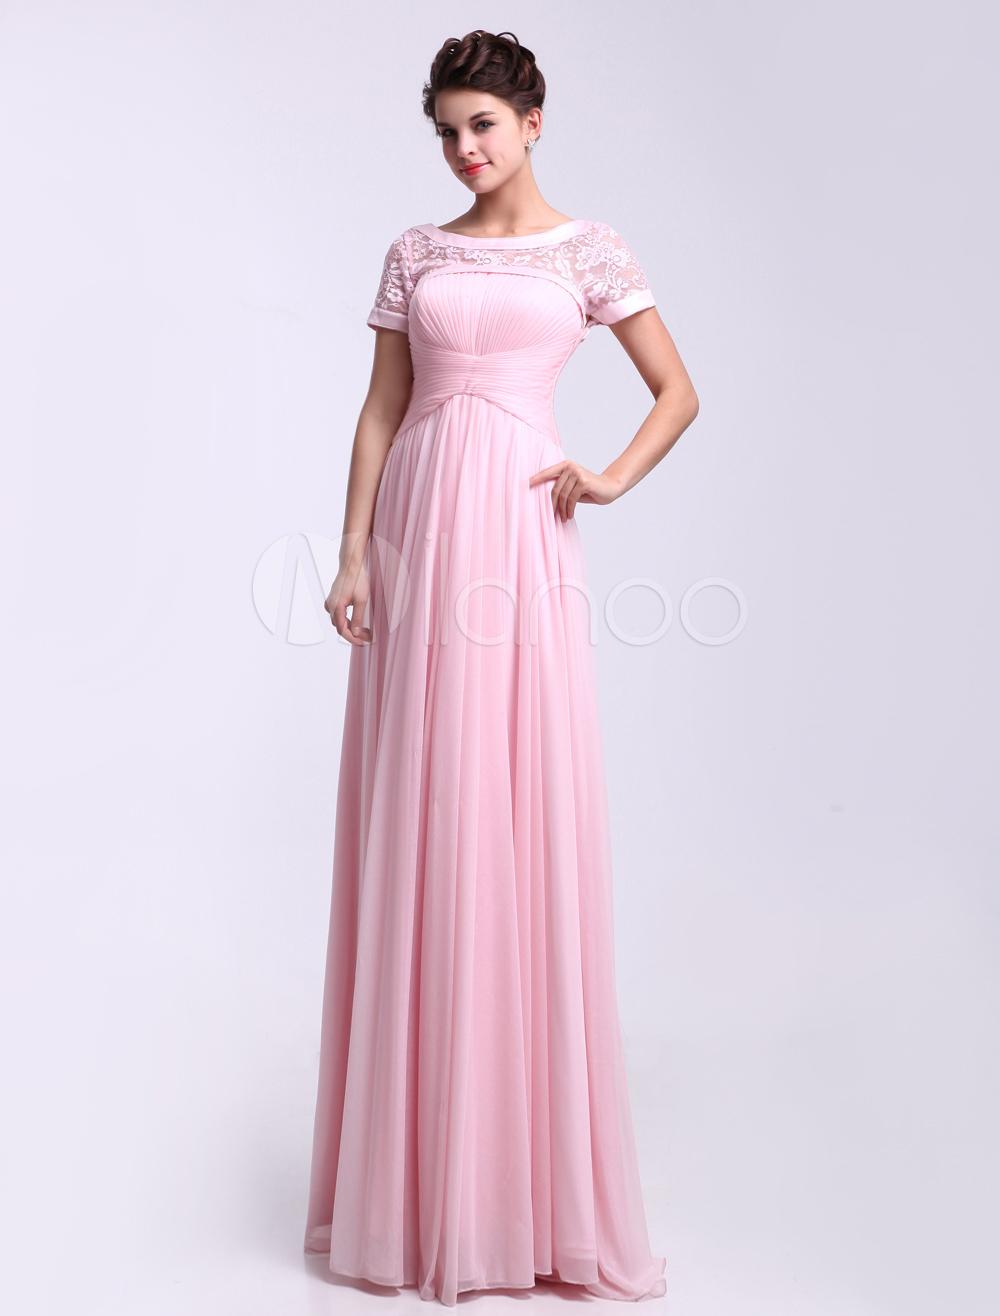 Scoop Neck Short Sleeves Ruched Shot-Silk Pink Elegant Bridesmaid Dress Milanoo (Wedding Bridesmaid Dresses) photo